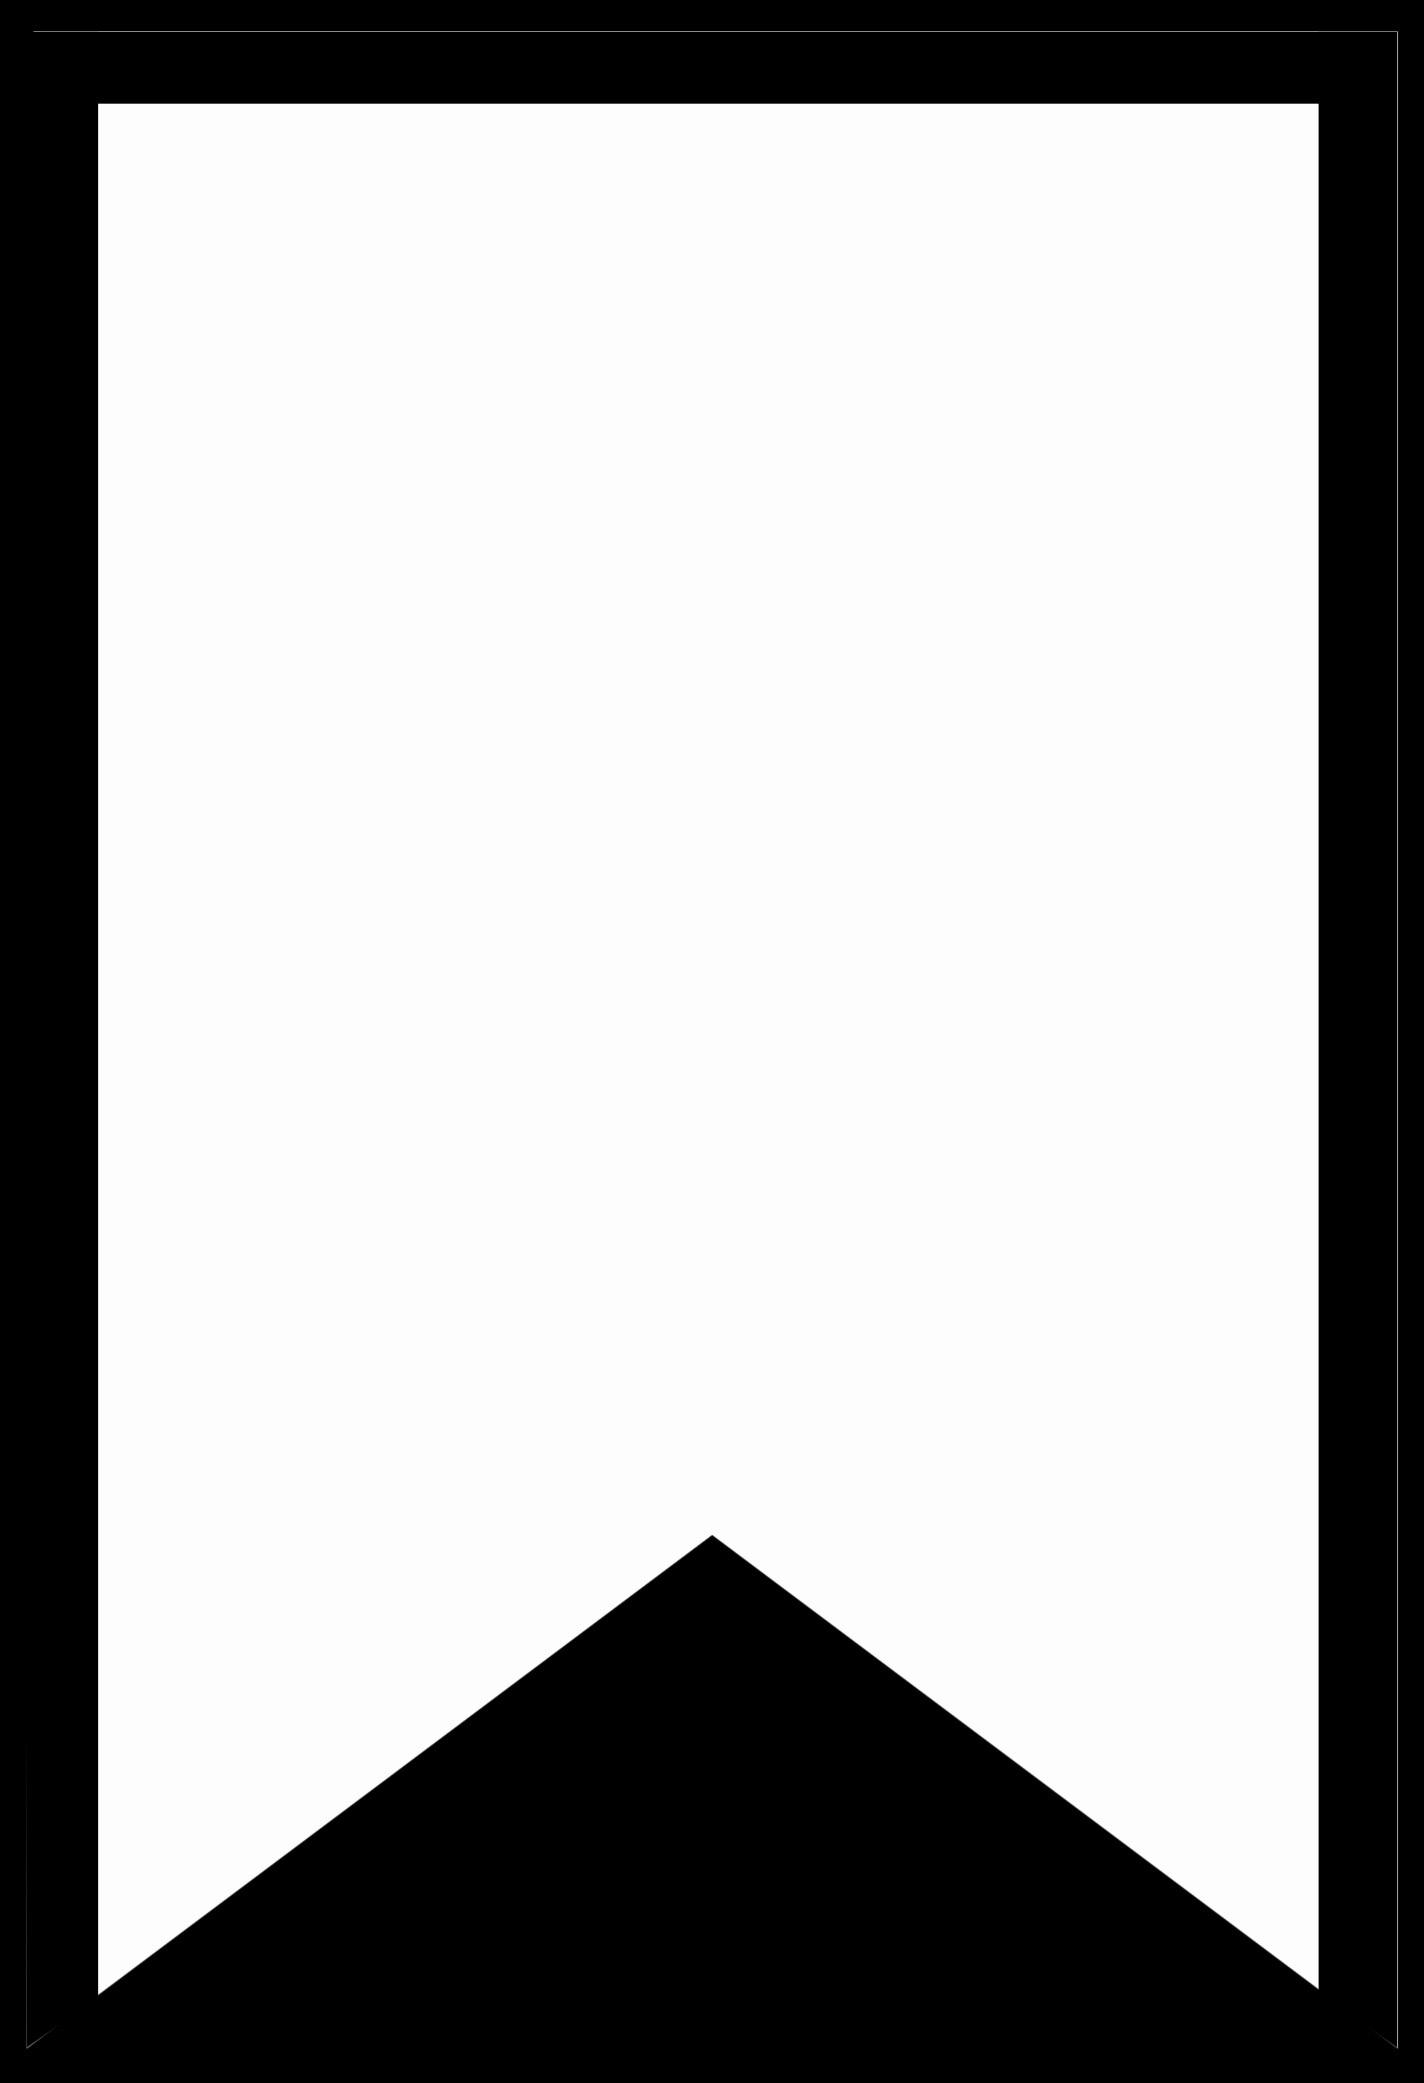 Free Printable Banner Templates Luxury Free Printable Banner Templates Blank Banners Paper